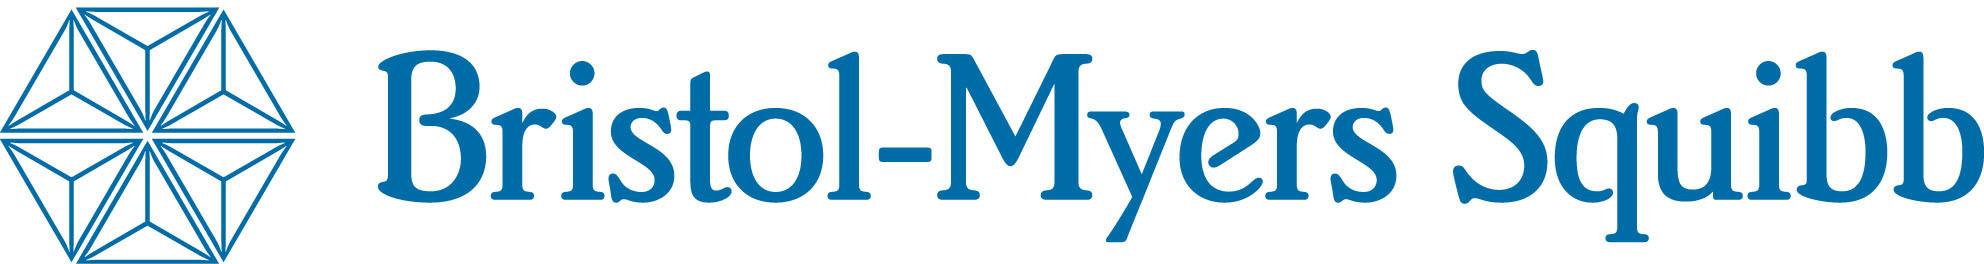 Bristol Myers Squibb - Exelixis and Bristol-Myers Squibb ...